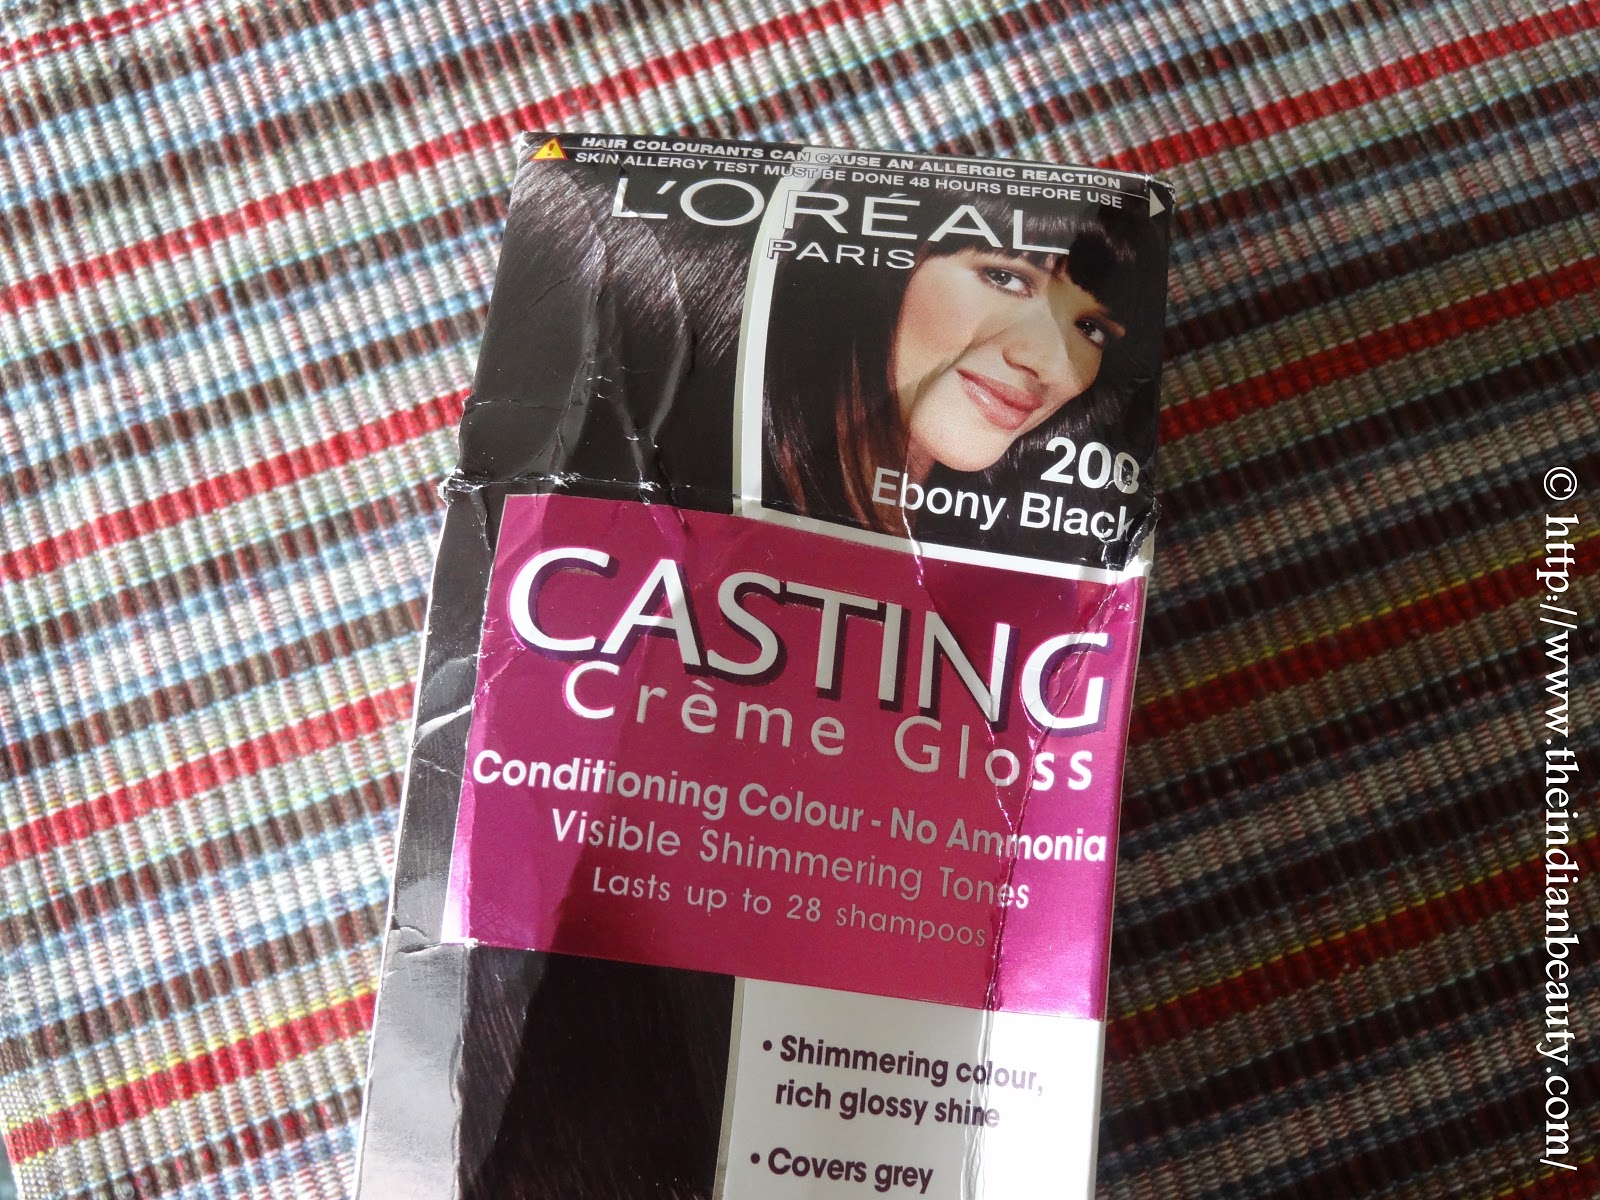 Loreal Paris Casting Creme Gloss 200 Ebony Black Review The